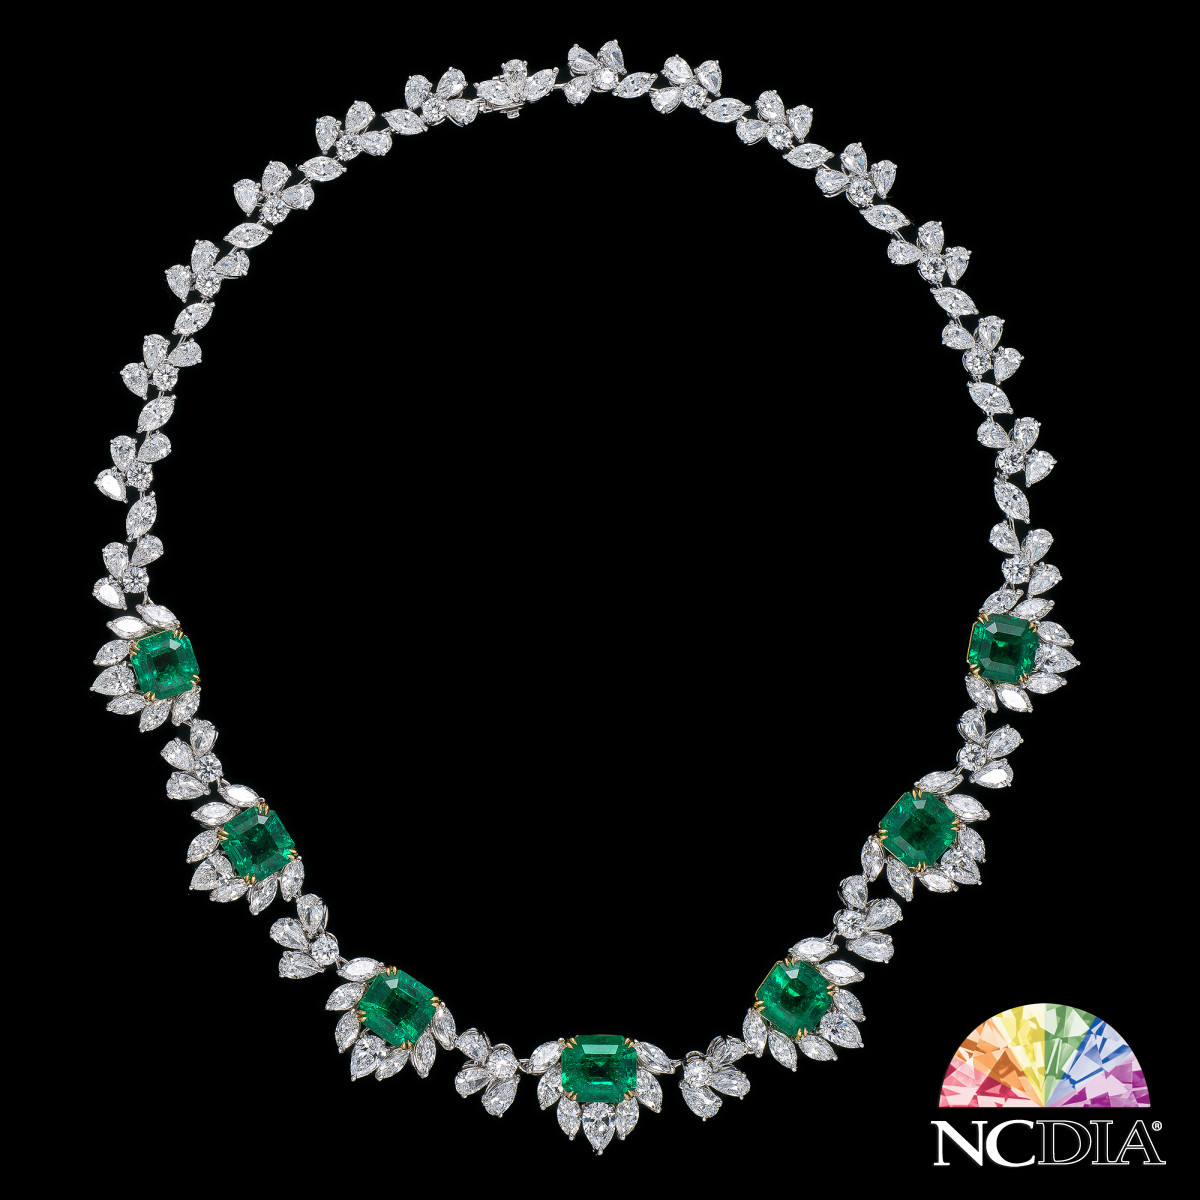 """Nobility"" Columbian Emerald Diamond Necklace, GUB certs ava."